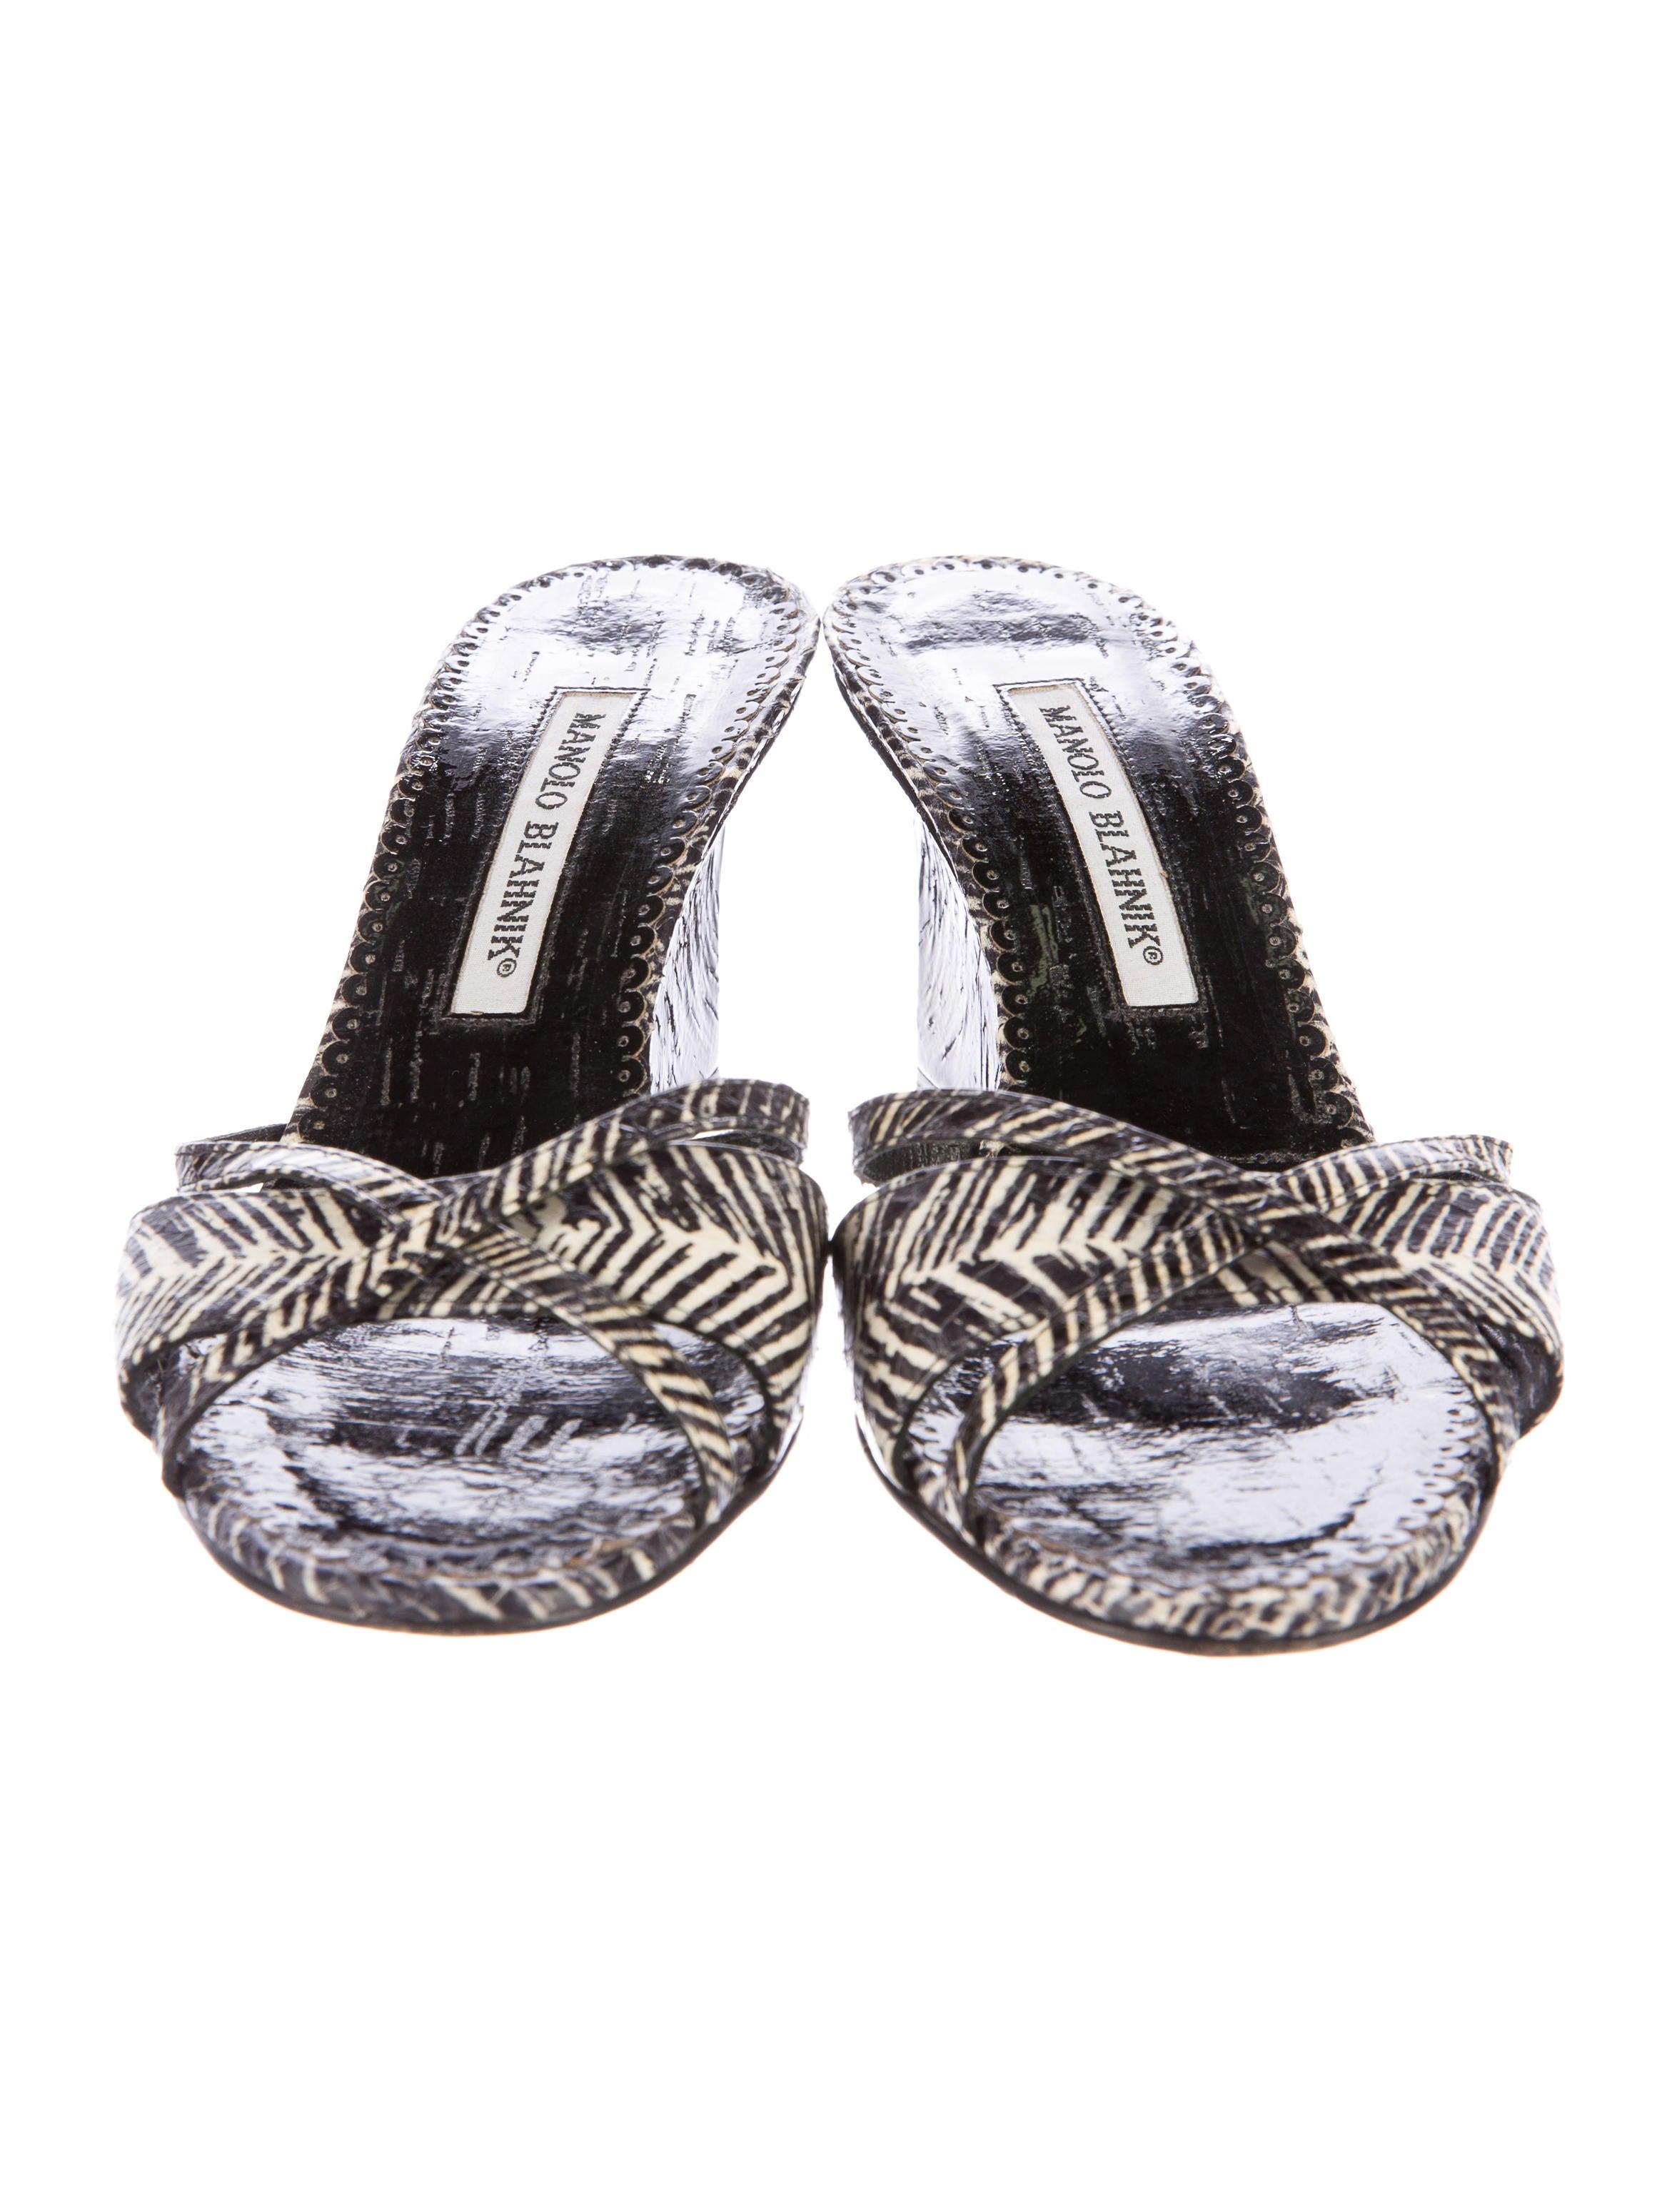 manolo blahnik zebra printed wedge sandals shoes